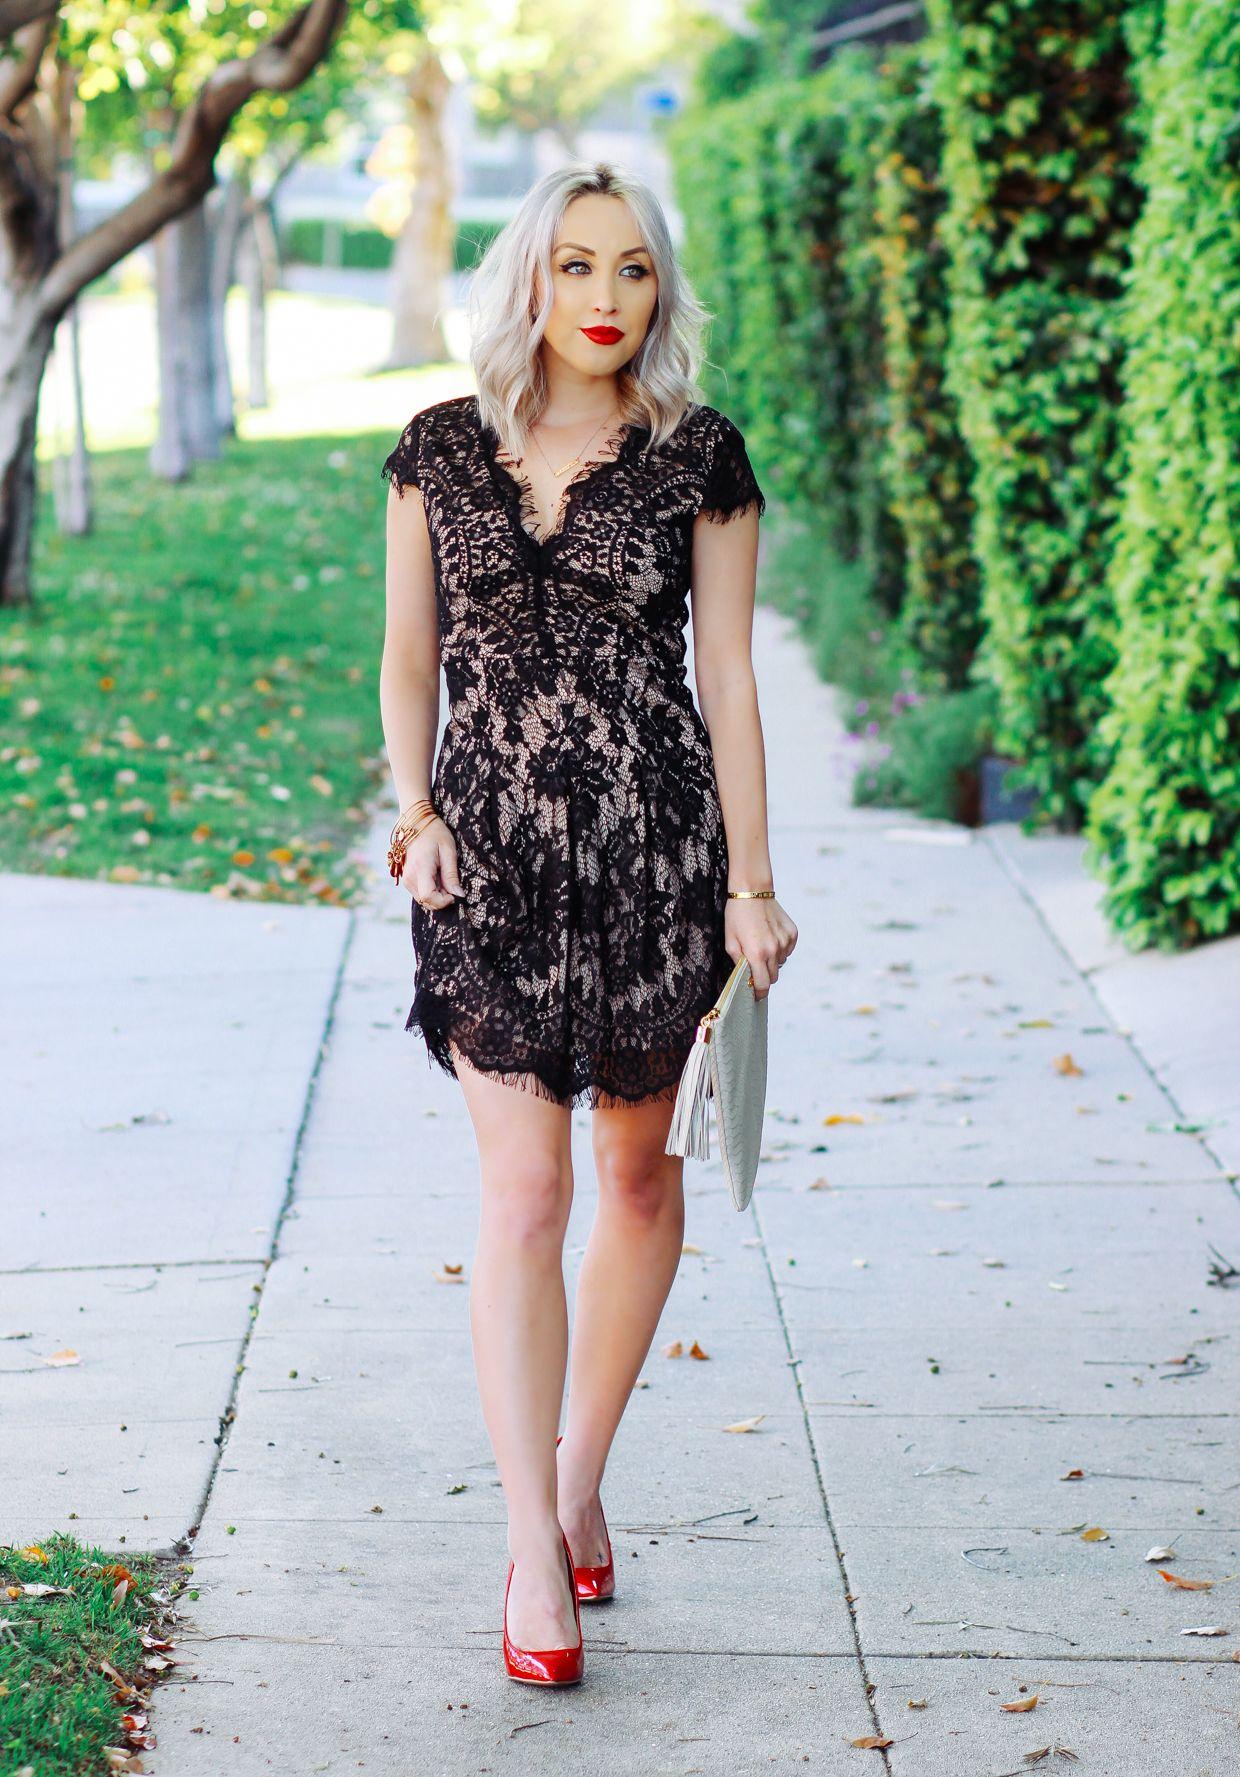 Identical Eyelash Dress For 24 Vs 165 Blondie In The City Dresses Eyelash Lace Dress Short Sleeve Dresses [ 1777 x 1240 Pixel ]